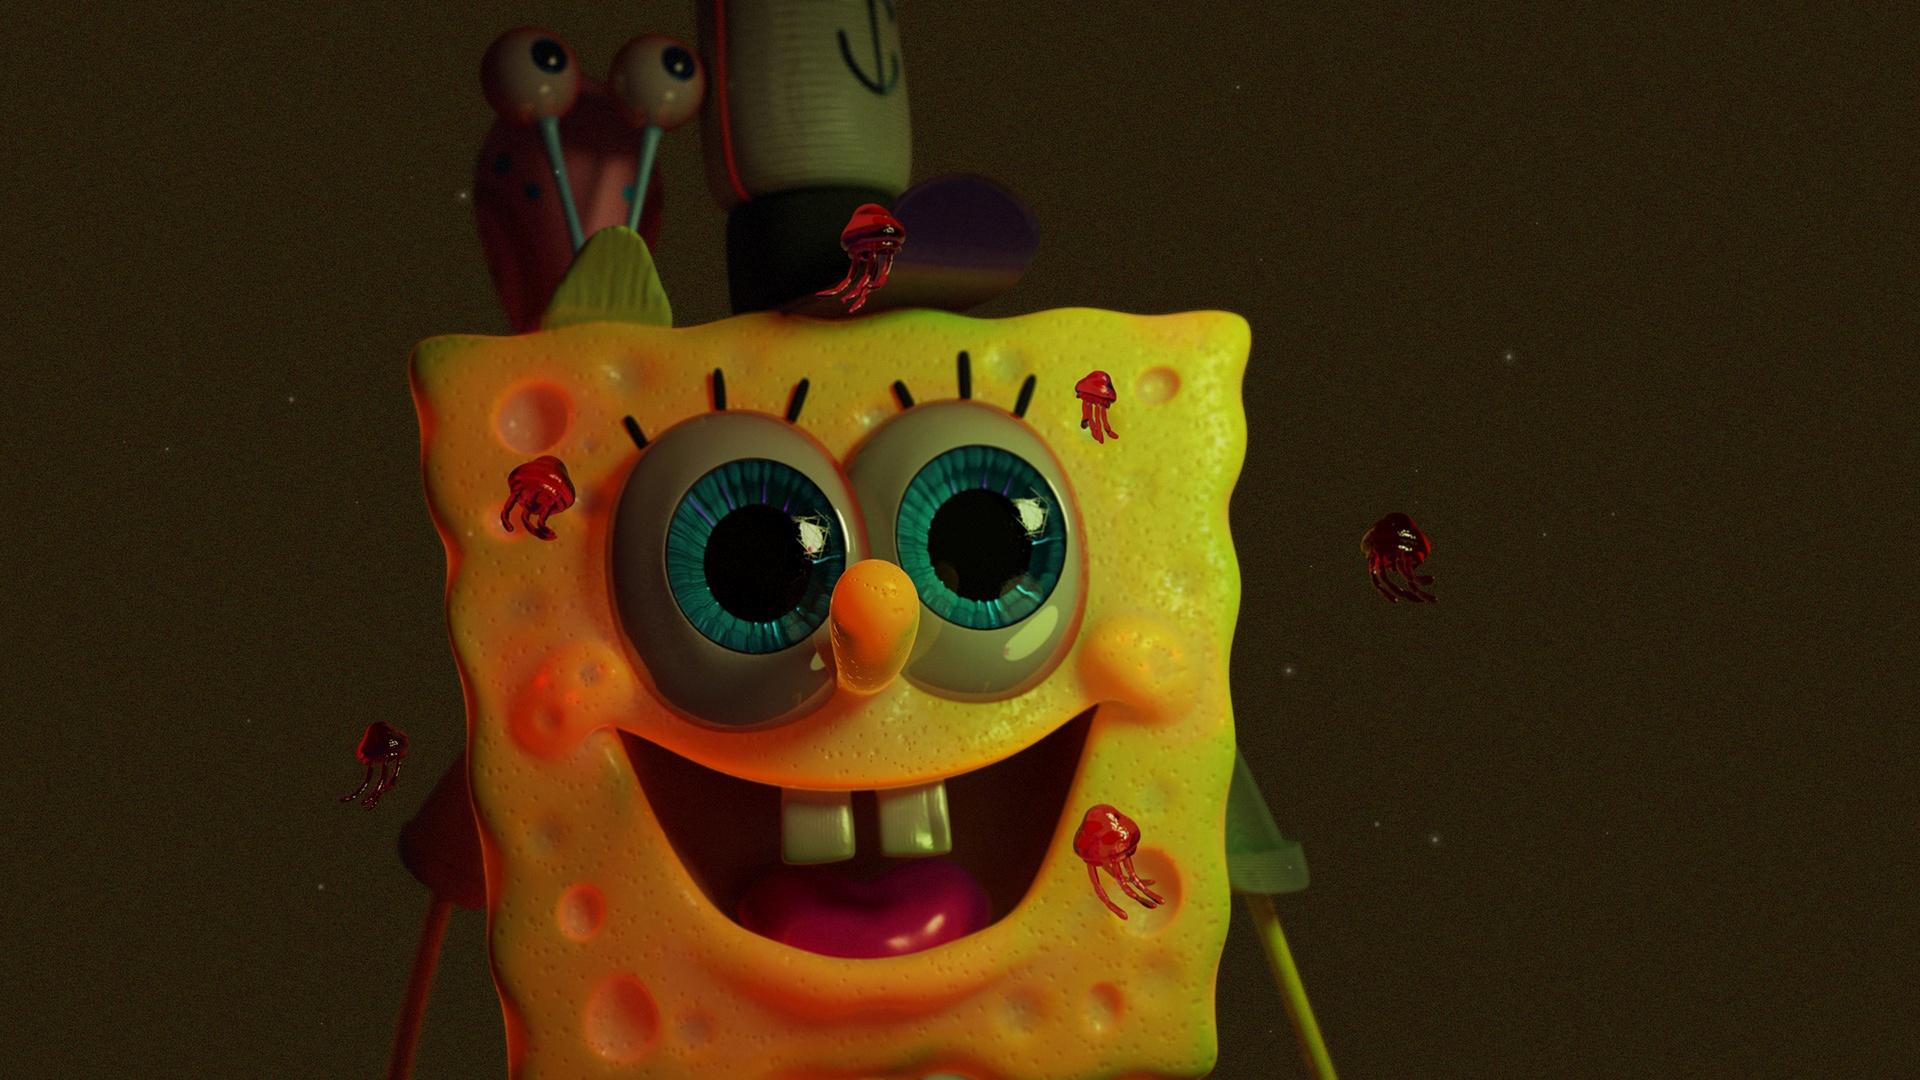 Sponge free background